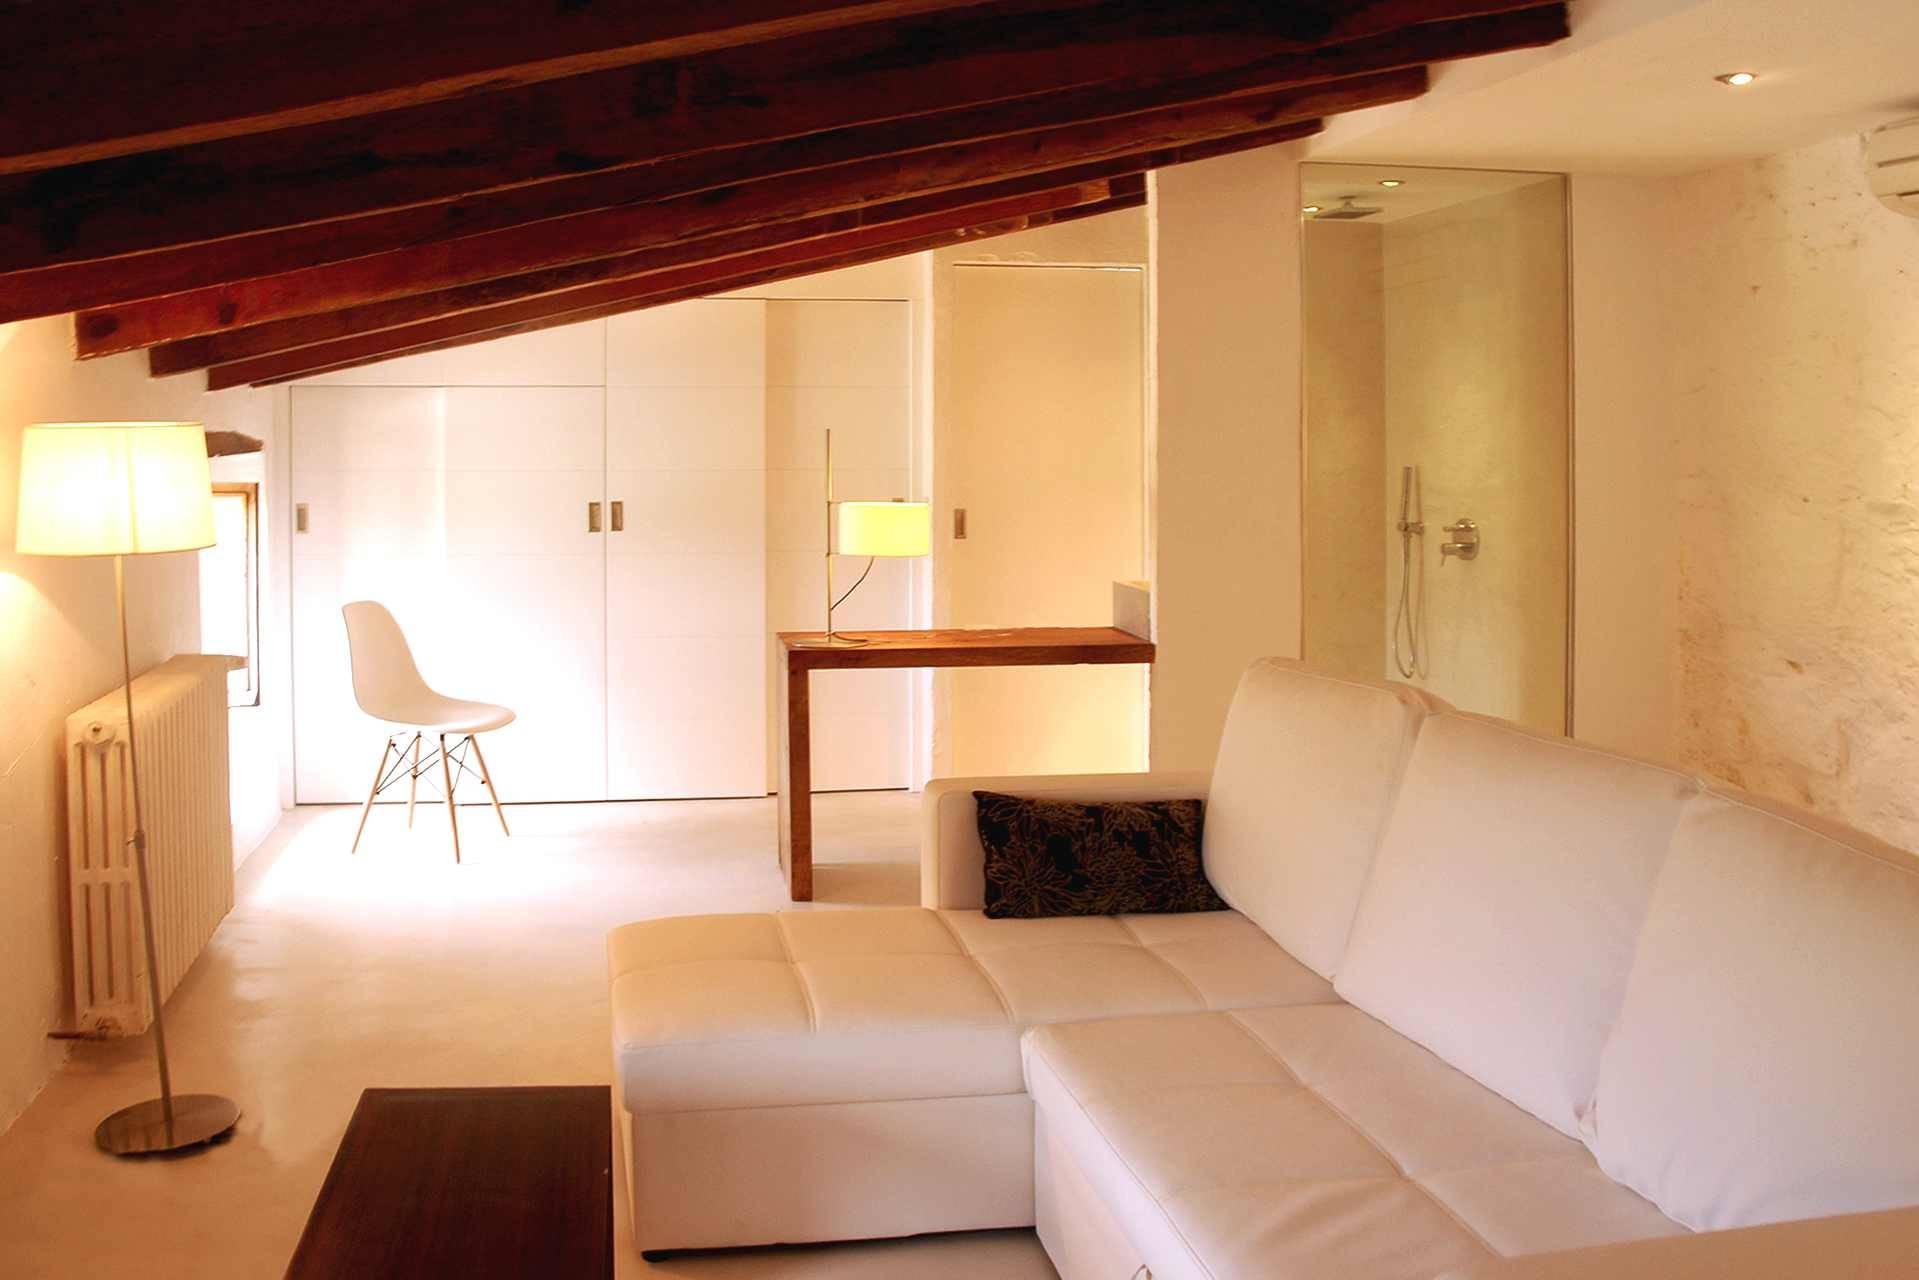 01-06 Charming Holiday Home Mallorca north Bild 26